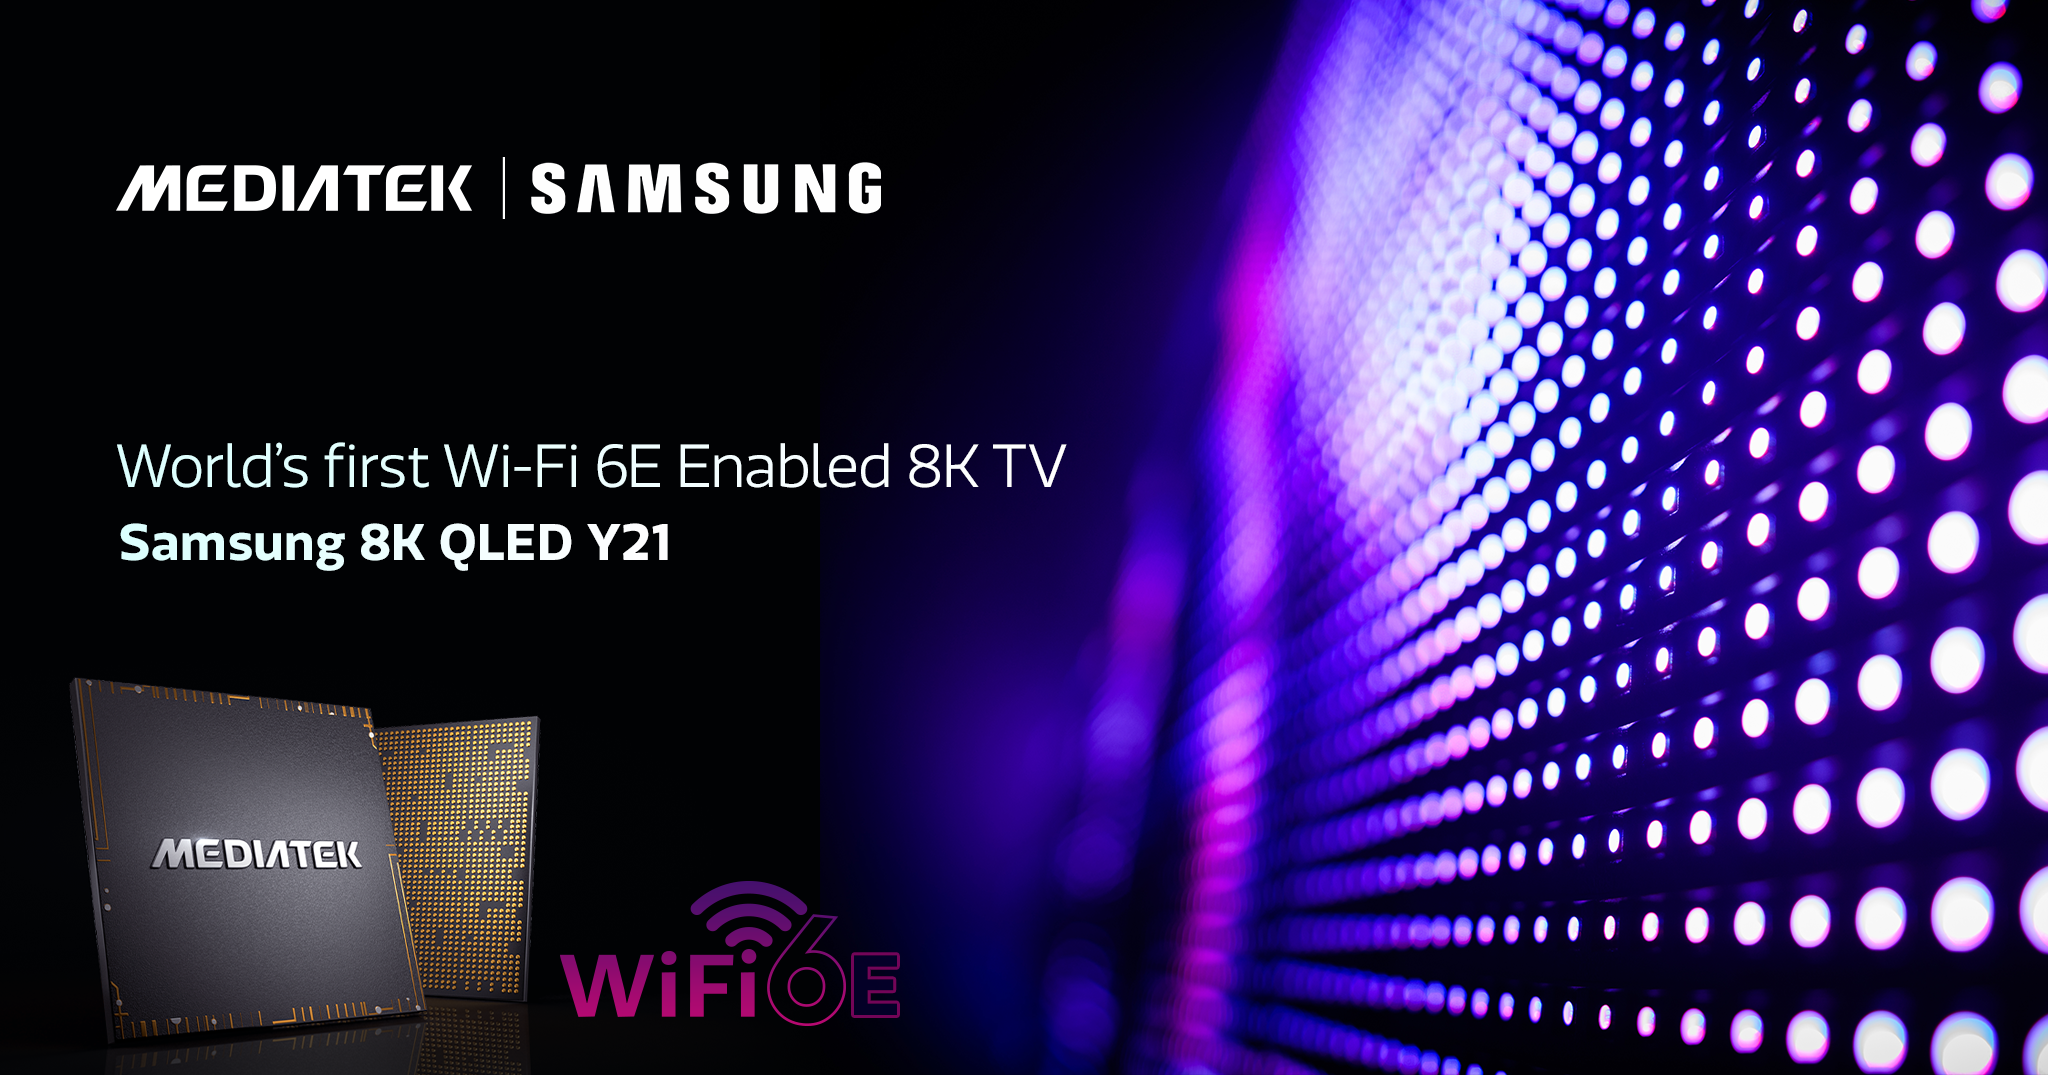 MediaTek and Samsung brings Wi-Fi 6E into 8K TVs